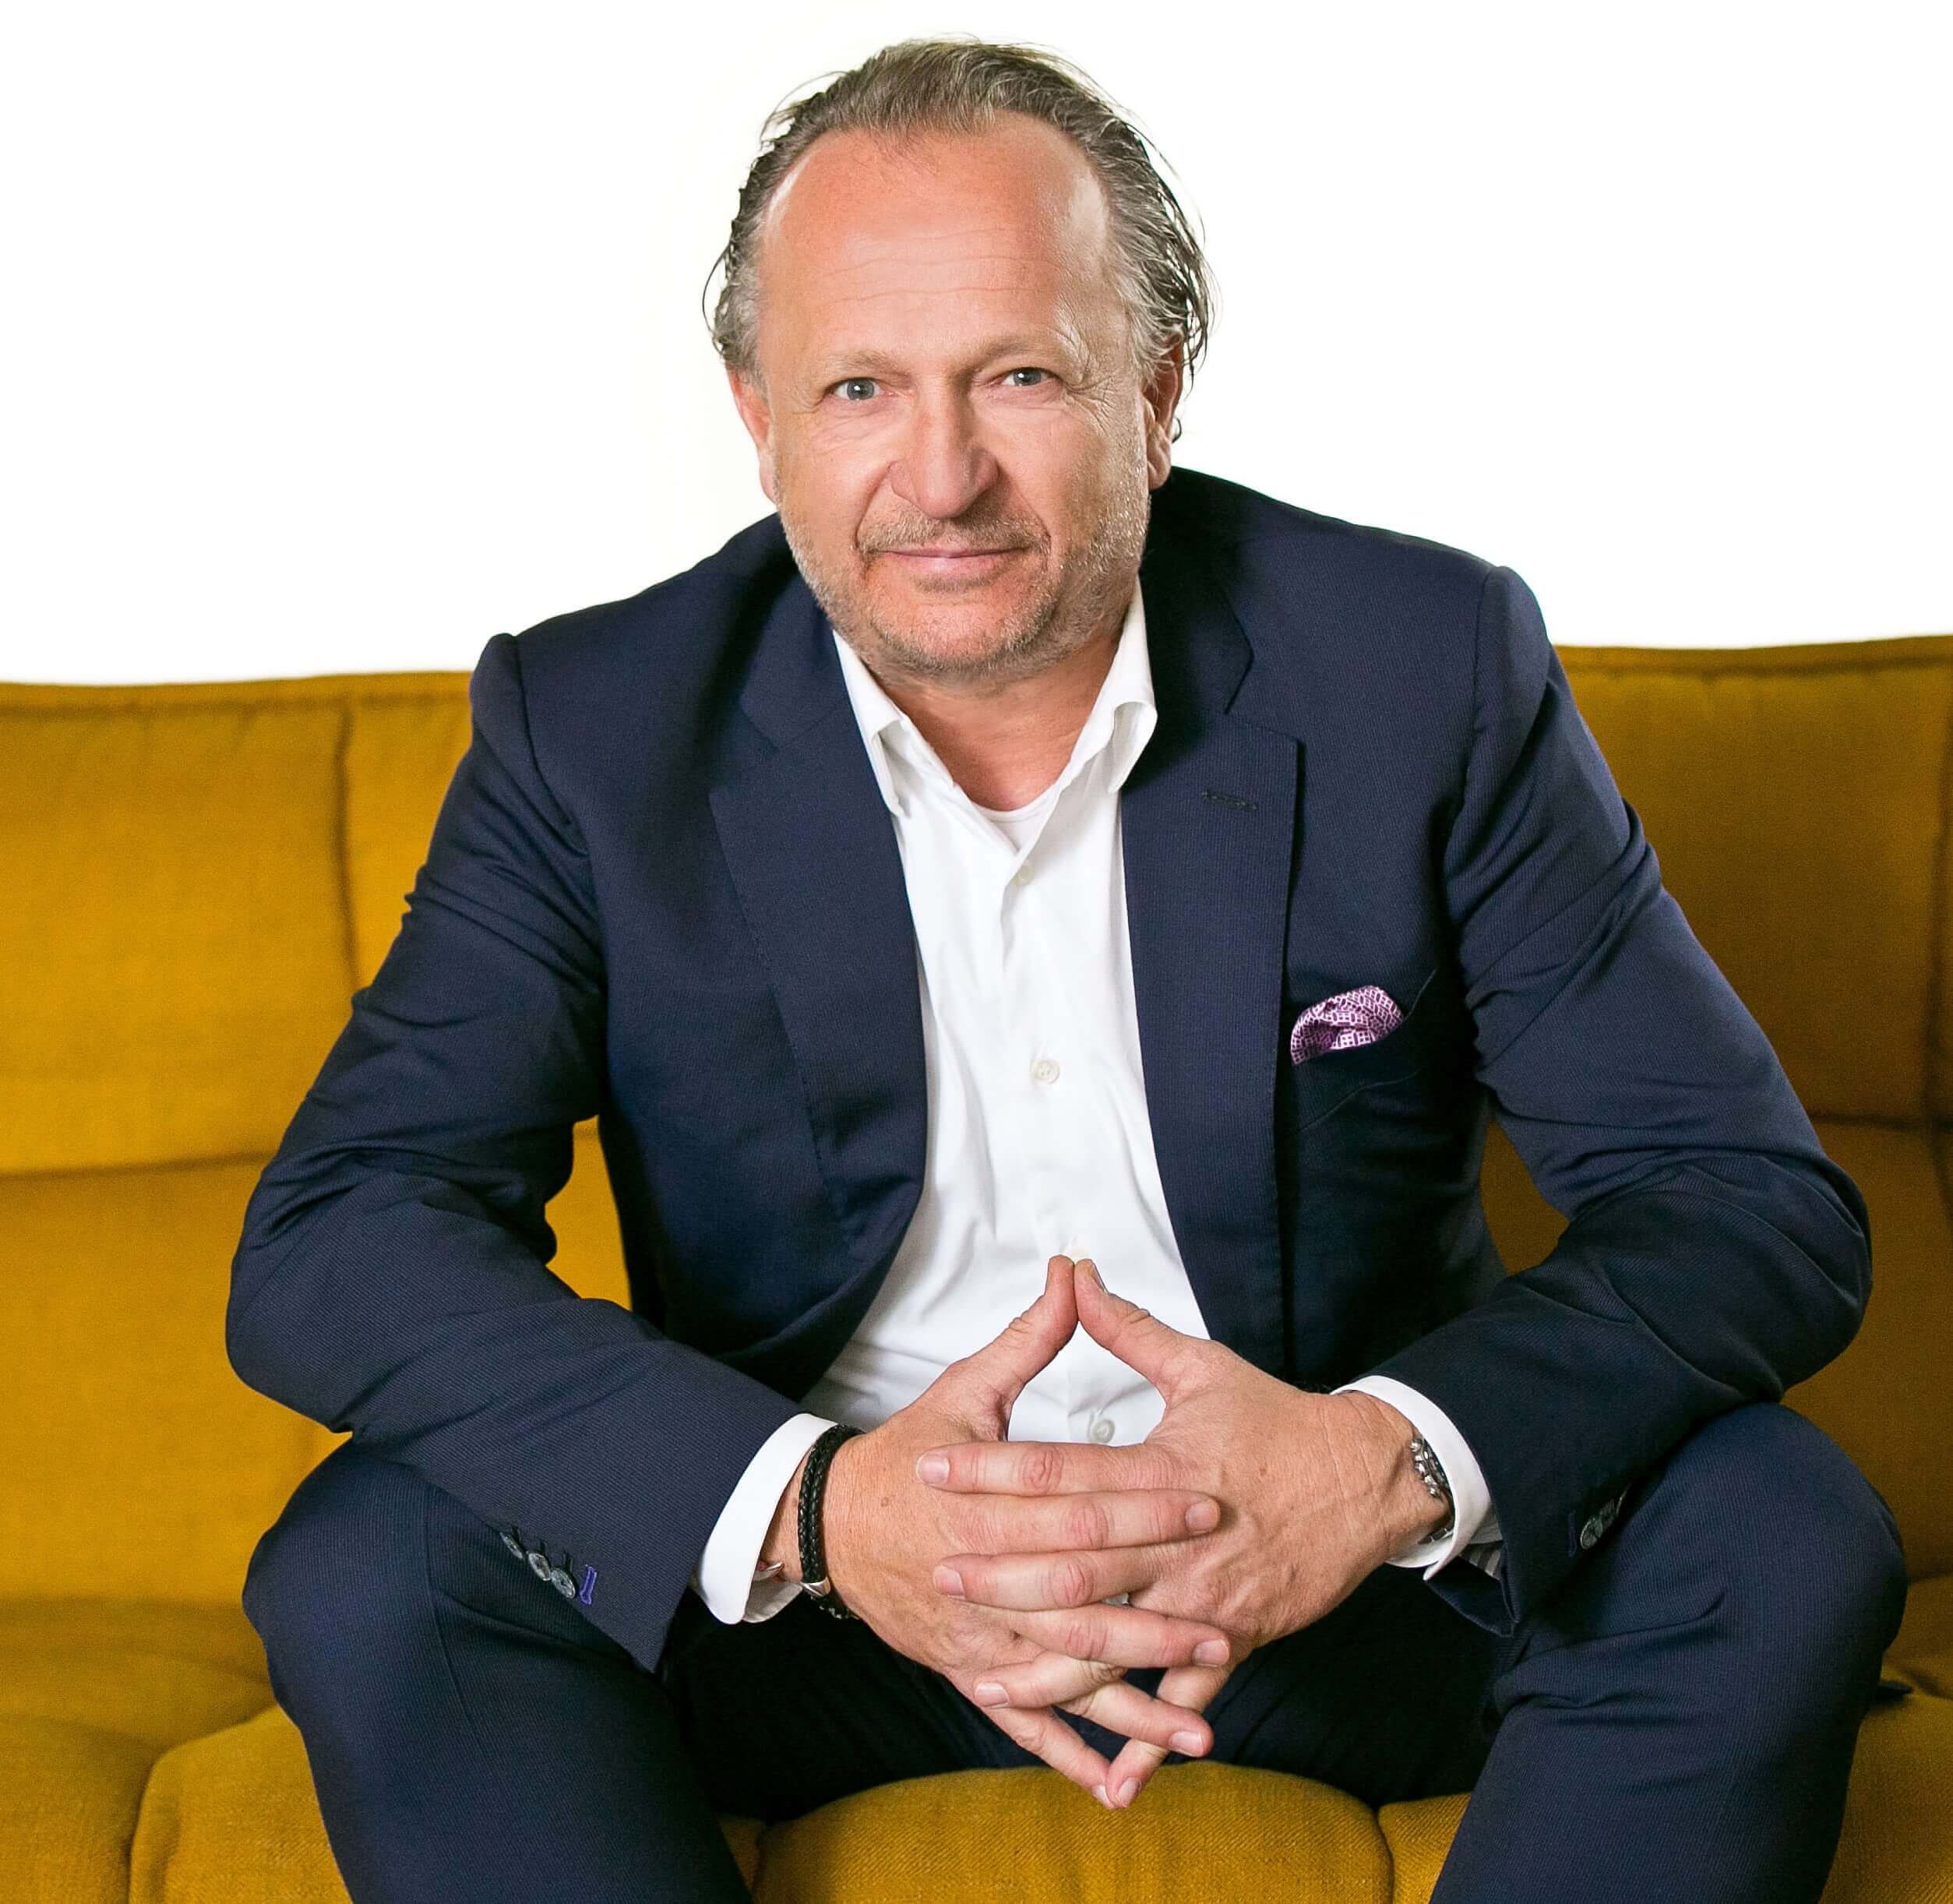 Agentur Passepartout – Thorsten Kalmutzke